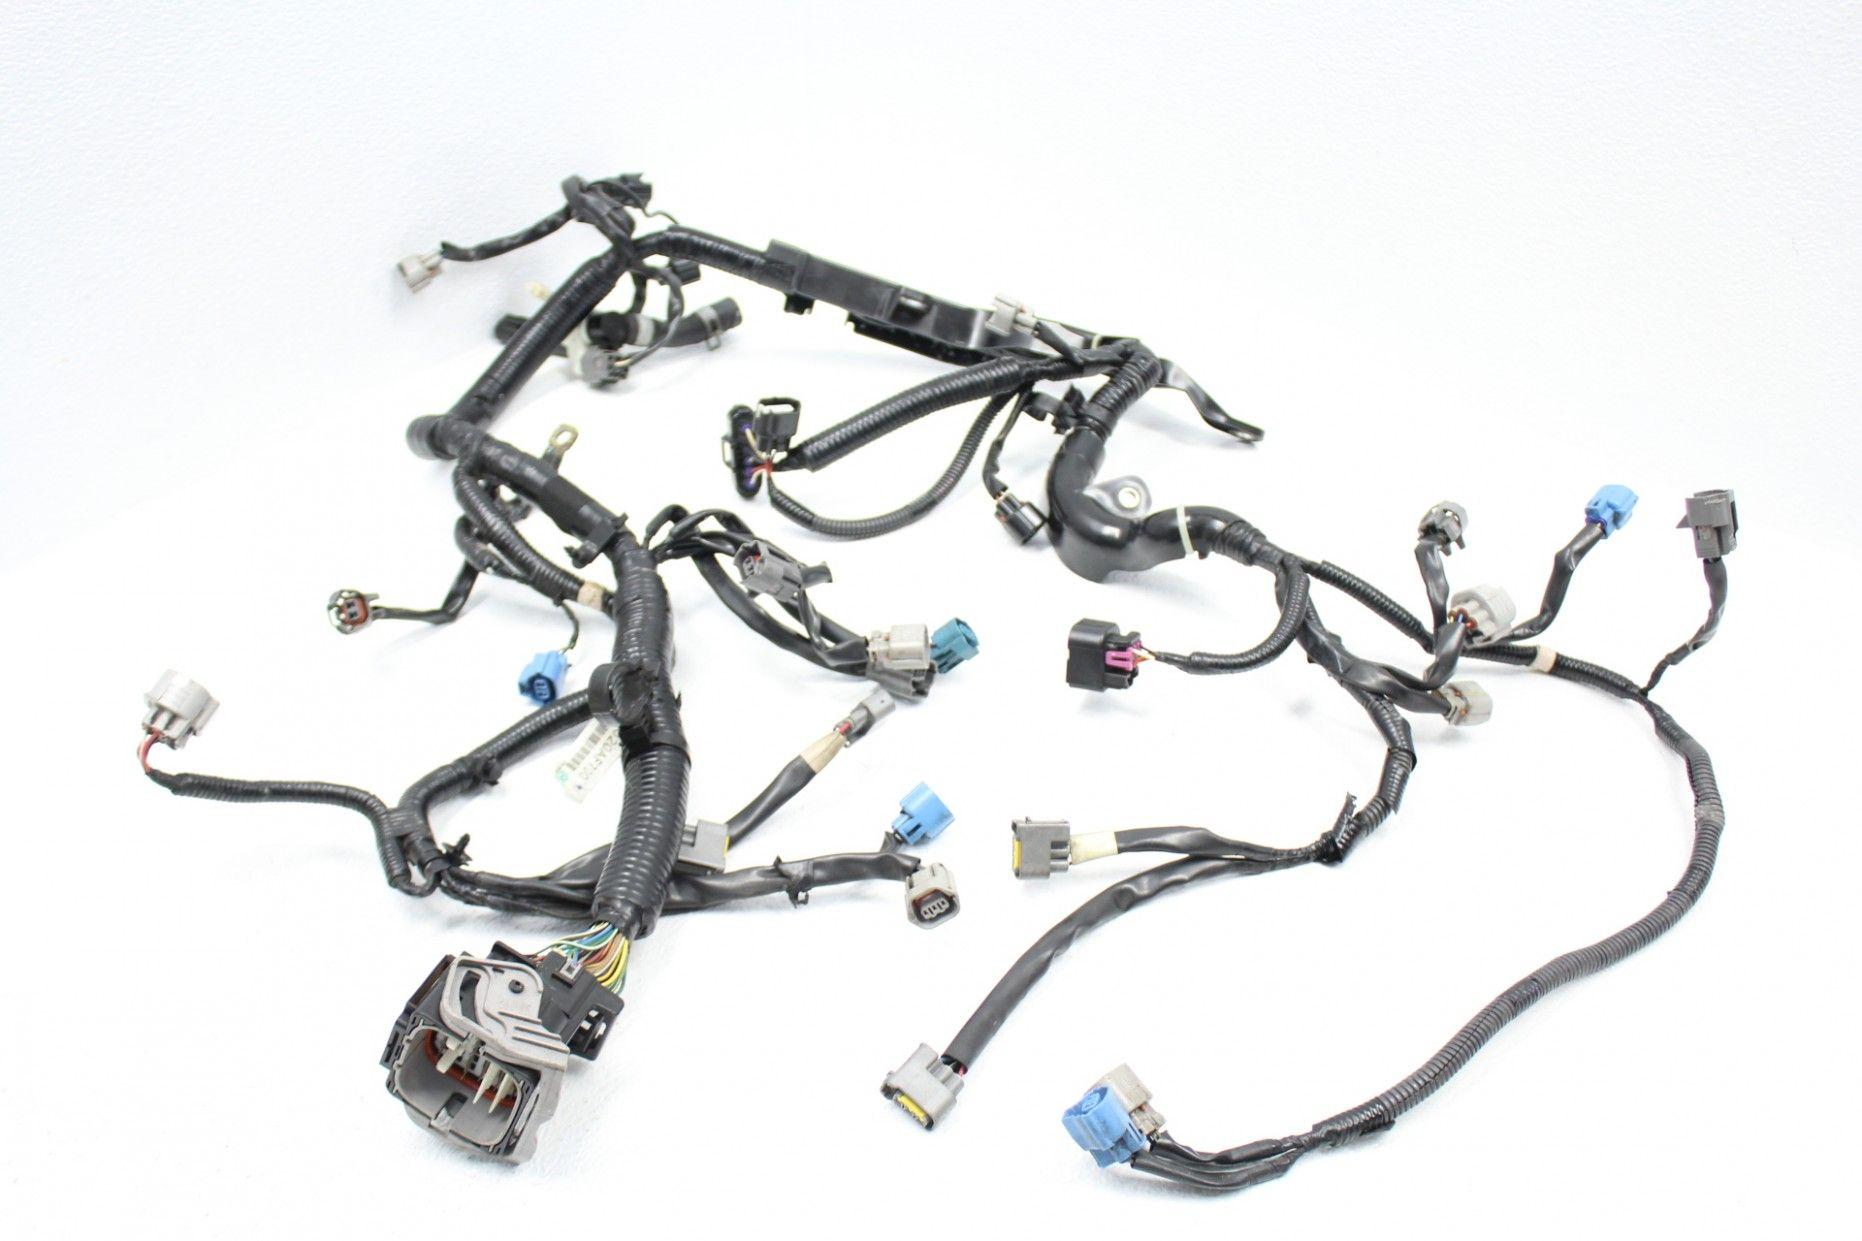 Subaru Ej5 Engine Diagram Subaru Ej5 Engine Diagram ...